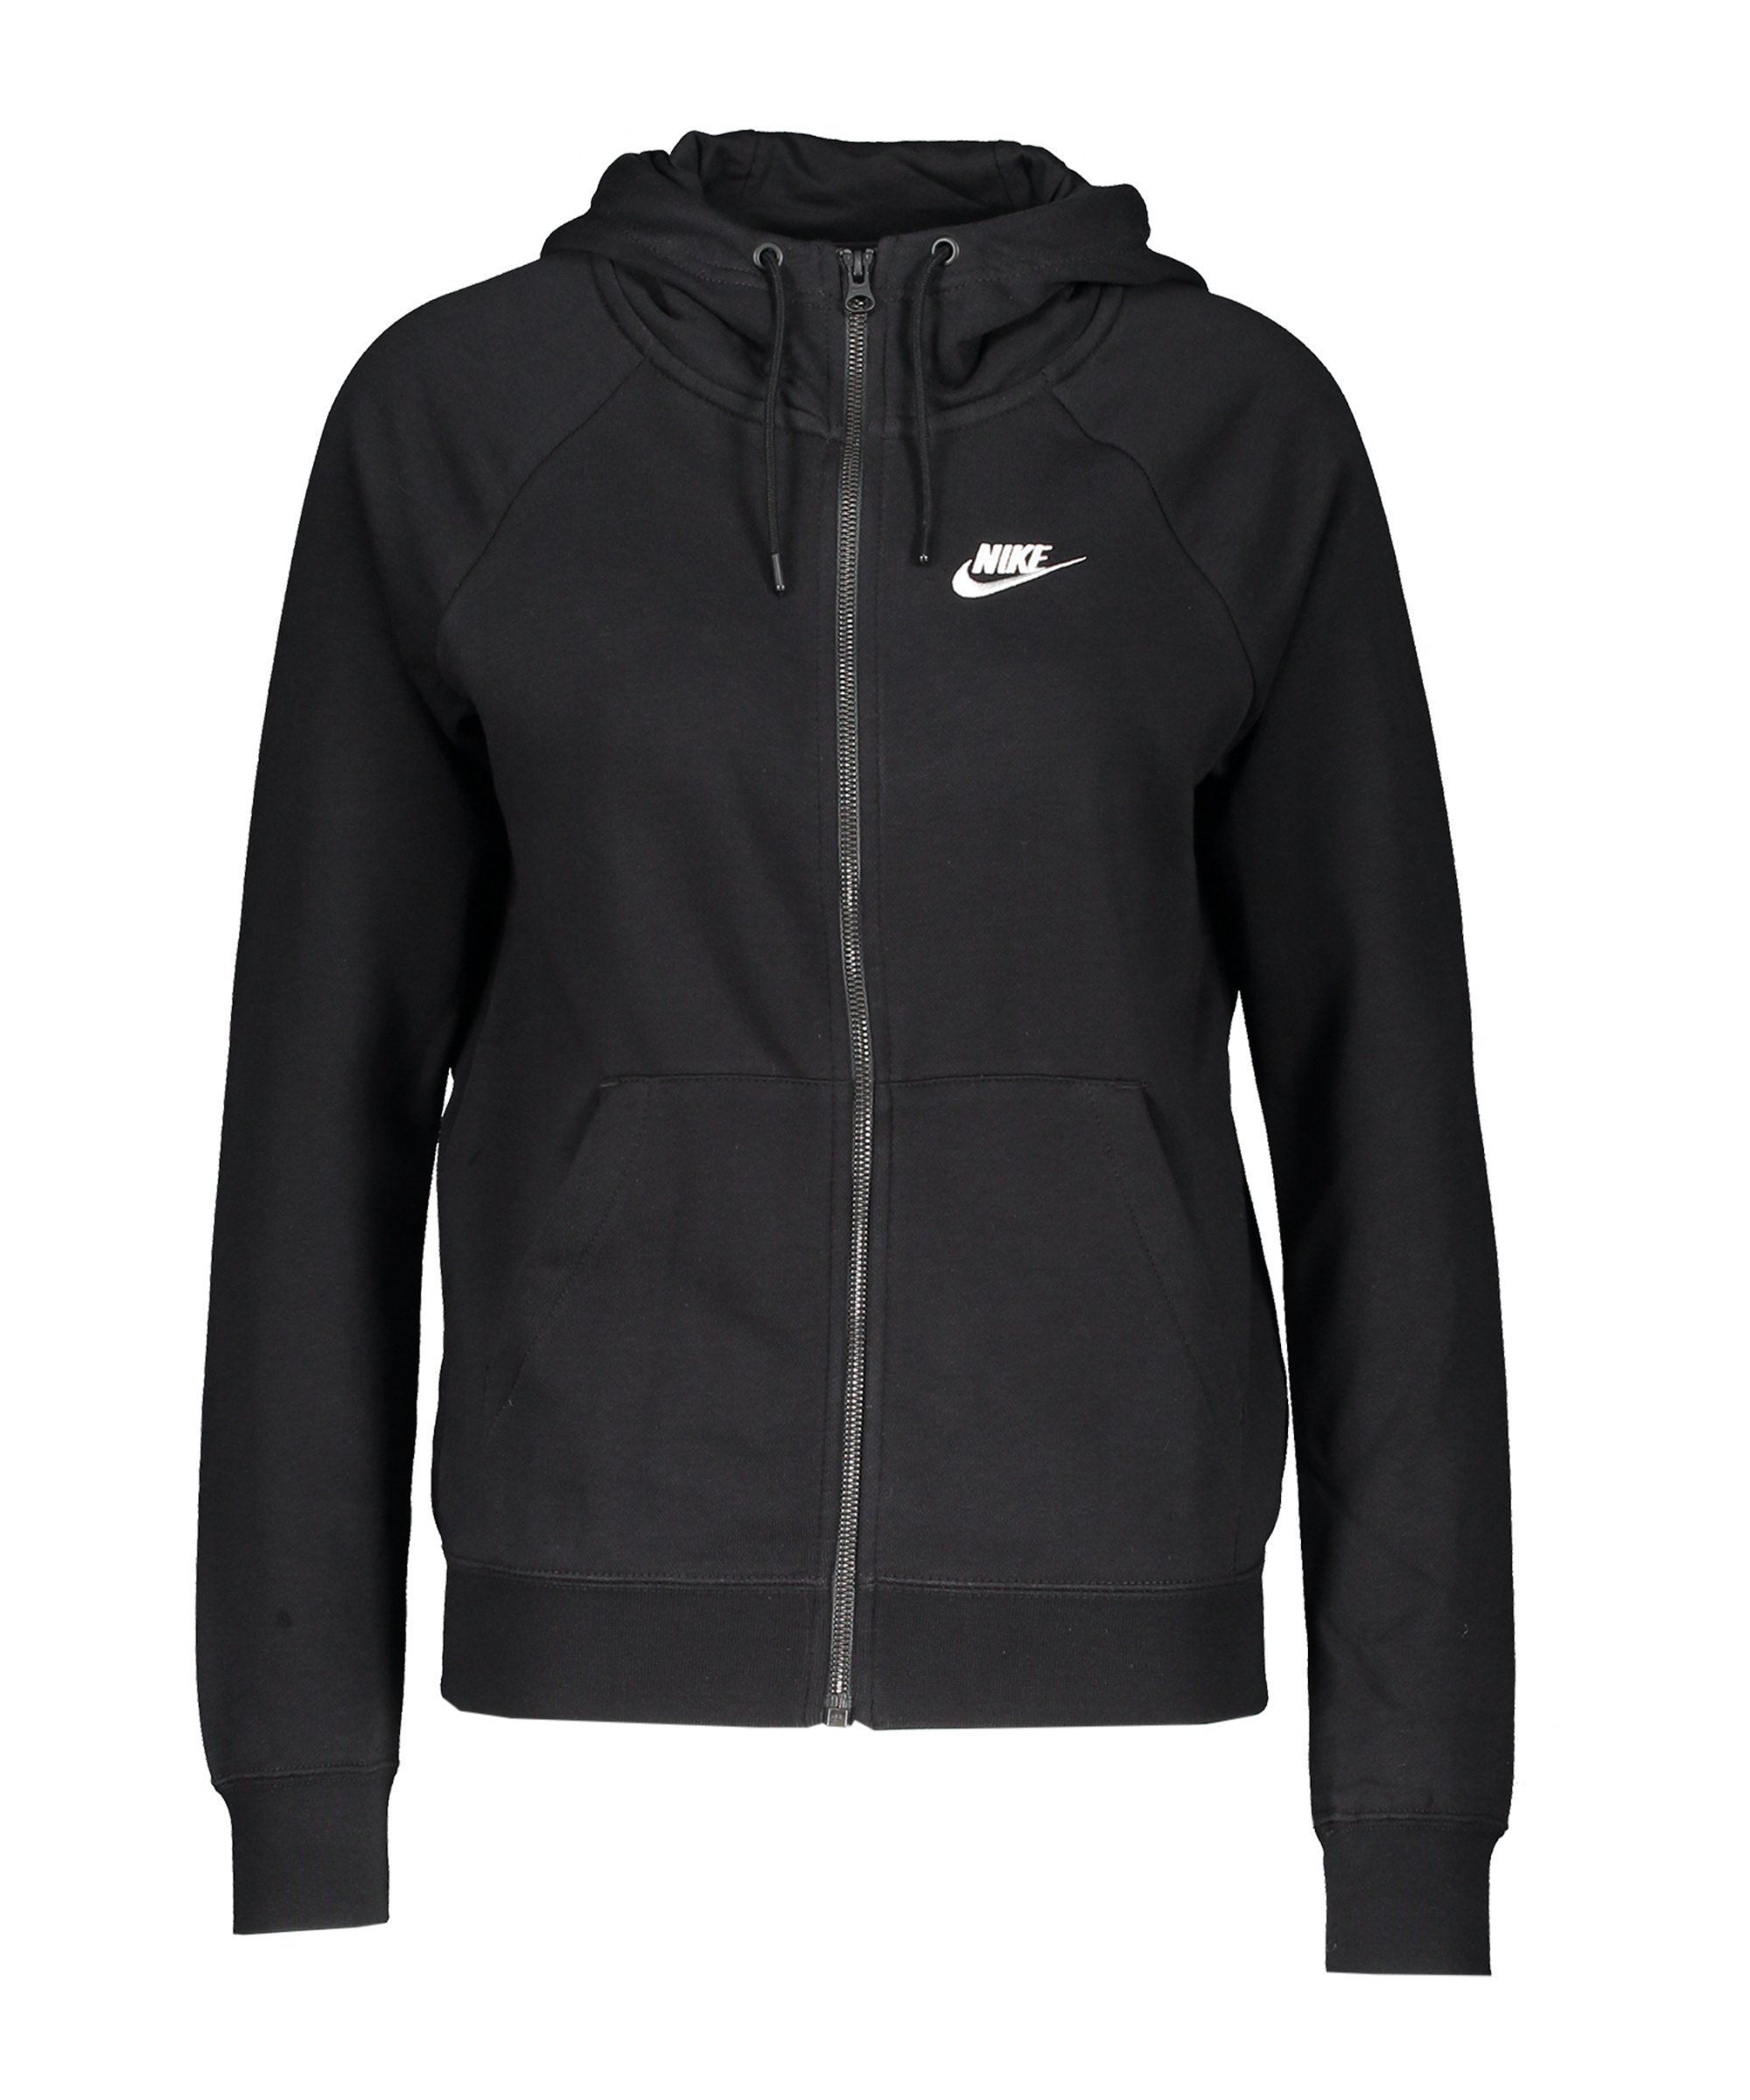 Nike Essential Fleece Kapuzenjacke Damen F010 - schwarz